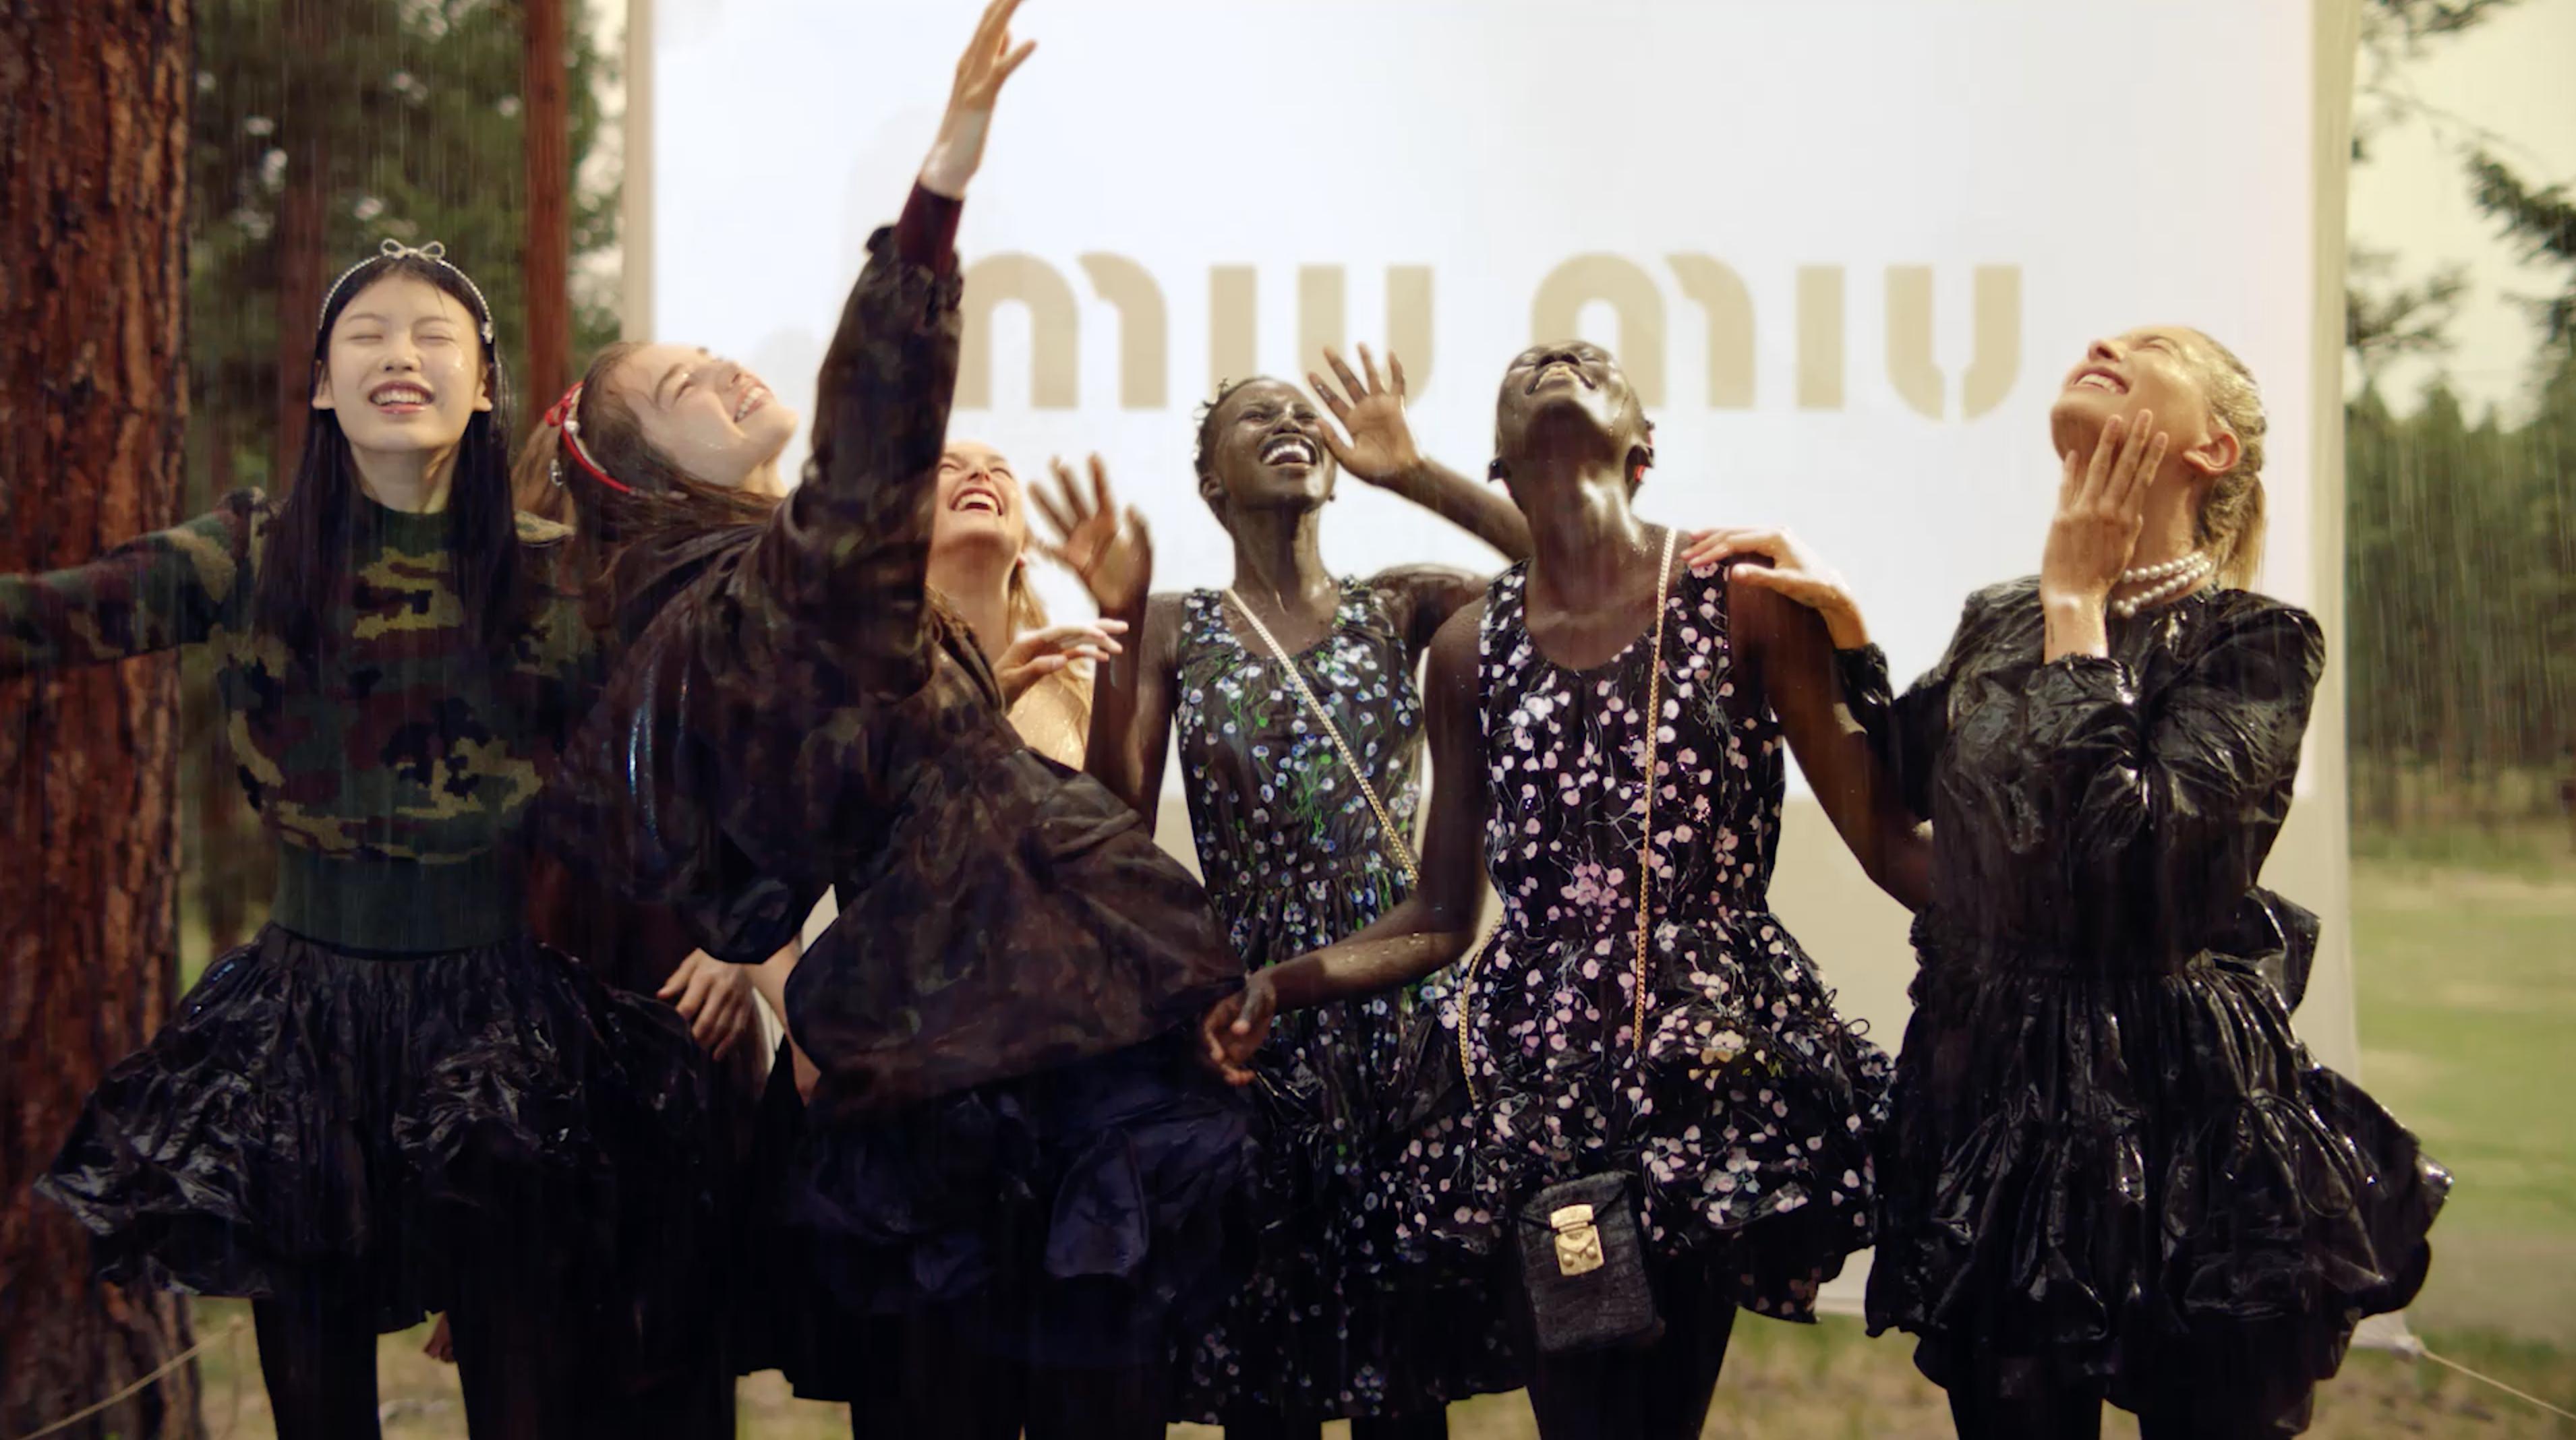 Miu Miu Fall 2019 Ad Campaign Film 'Paws Up' by Eddie Wrey